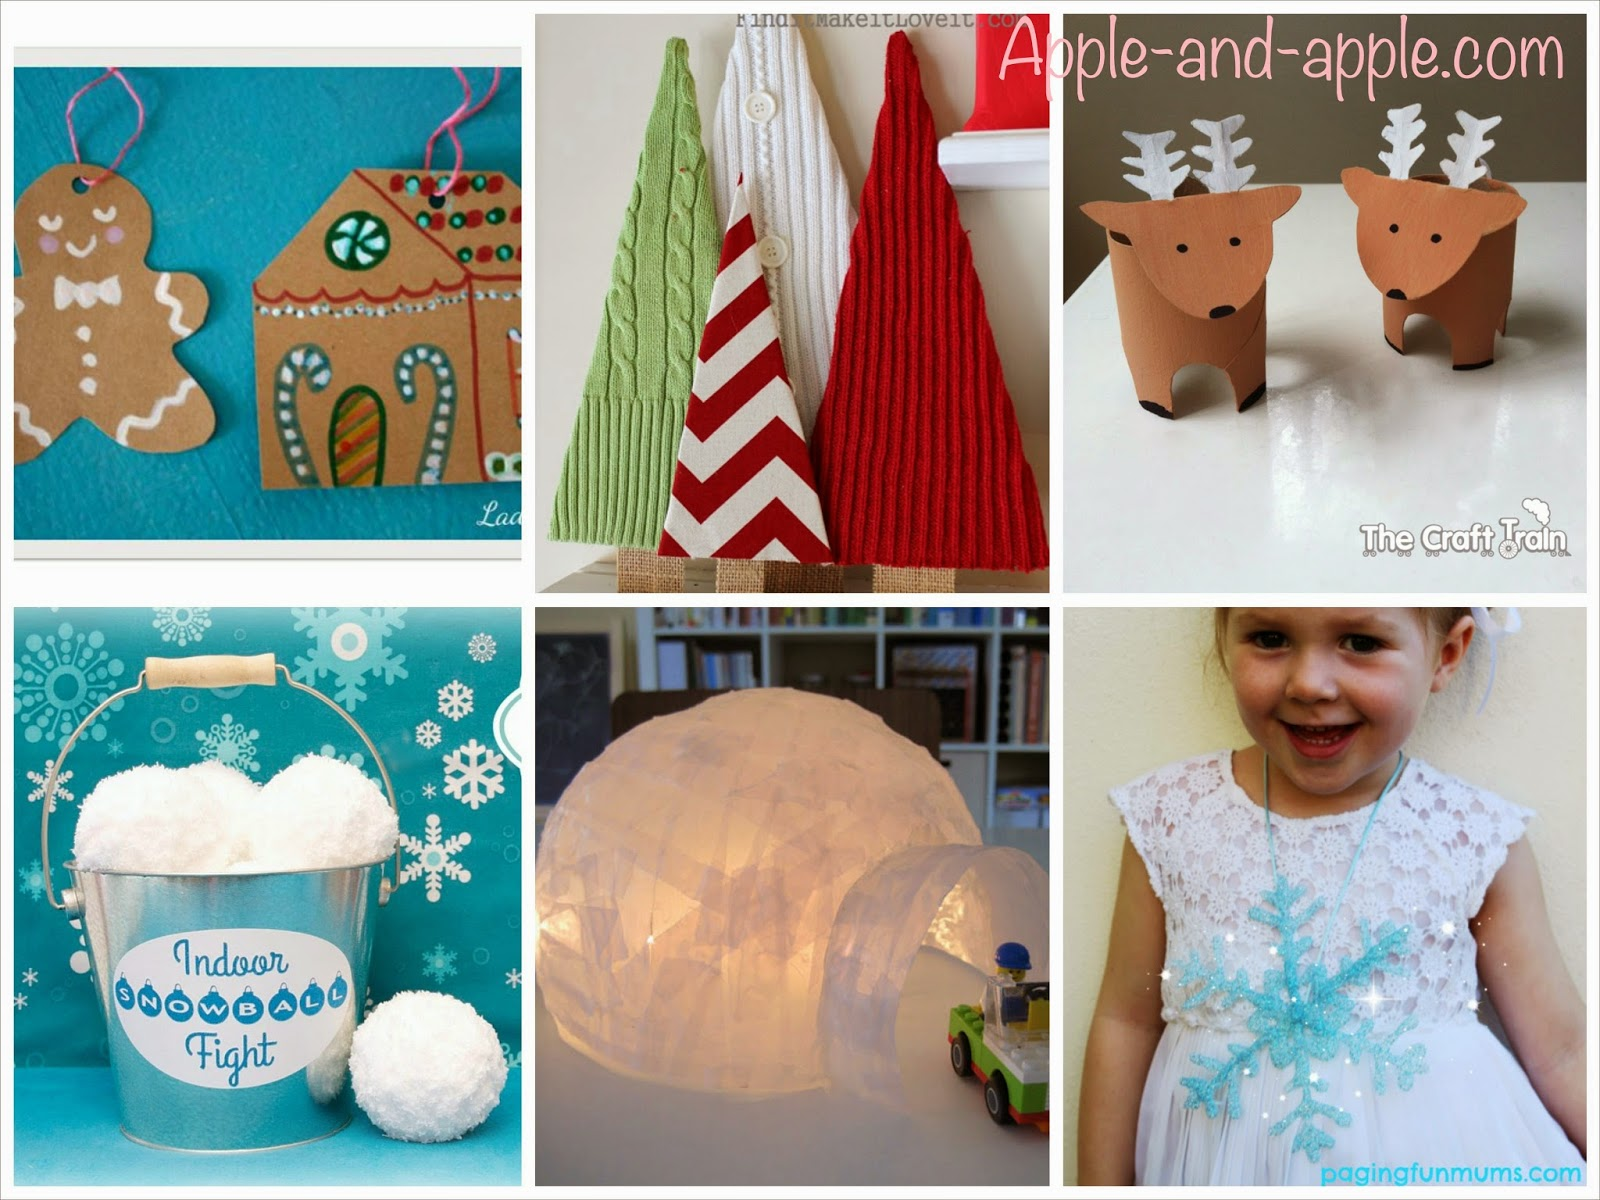 Идеи детских поделок к празднику